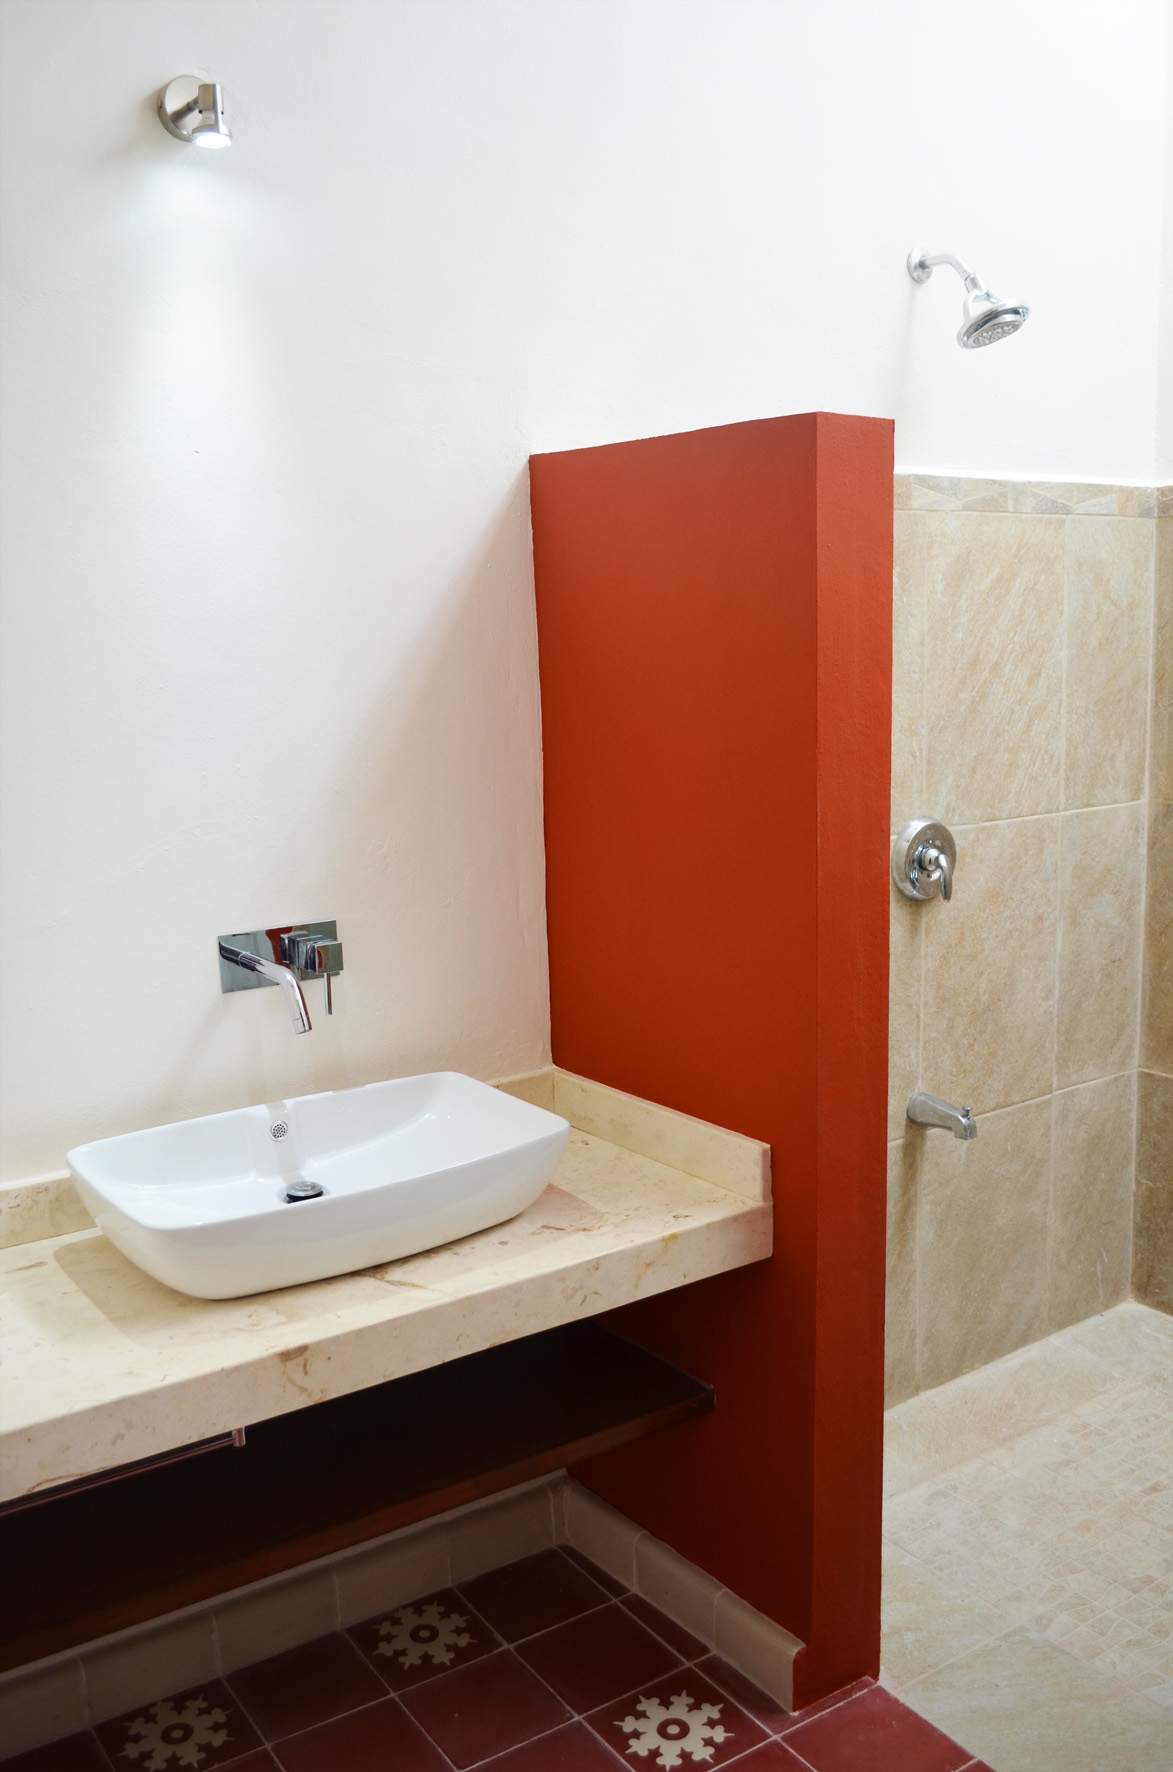 San Teodoro, master bathroom 2